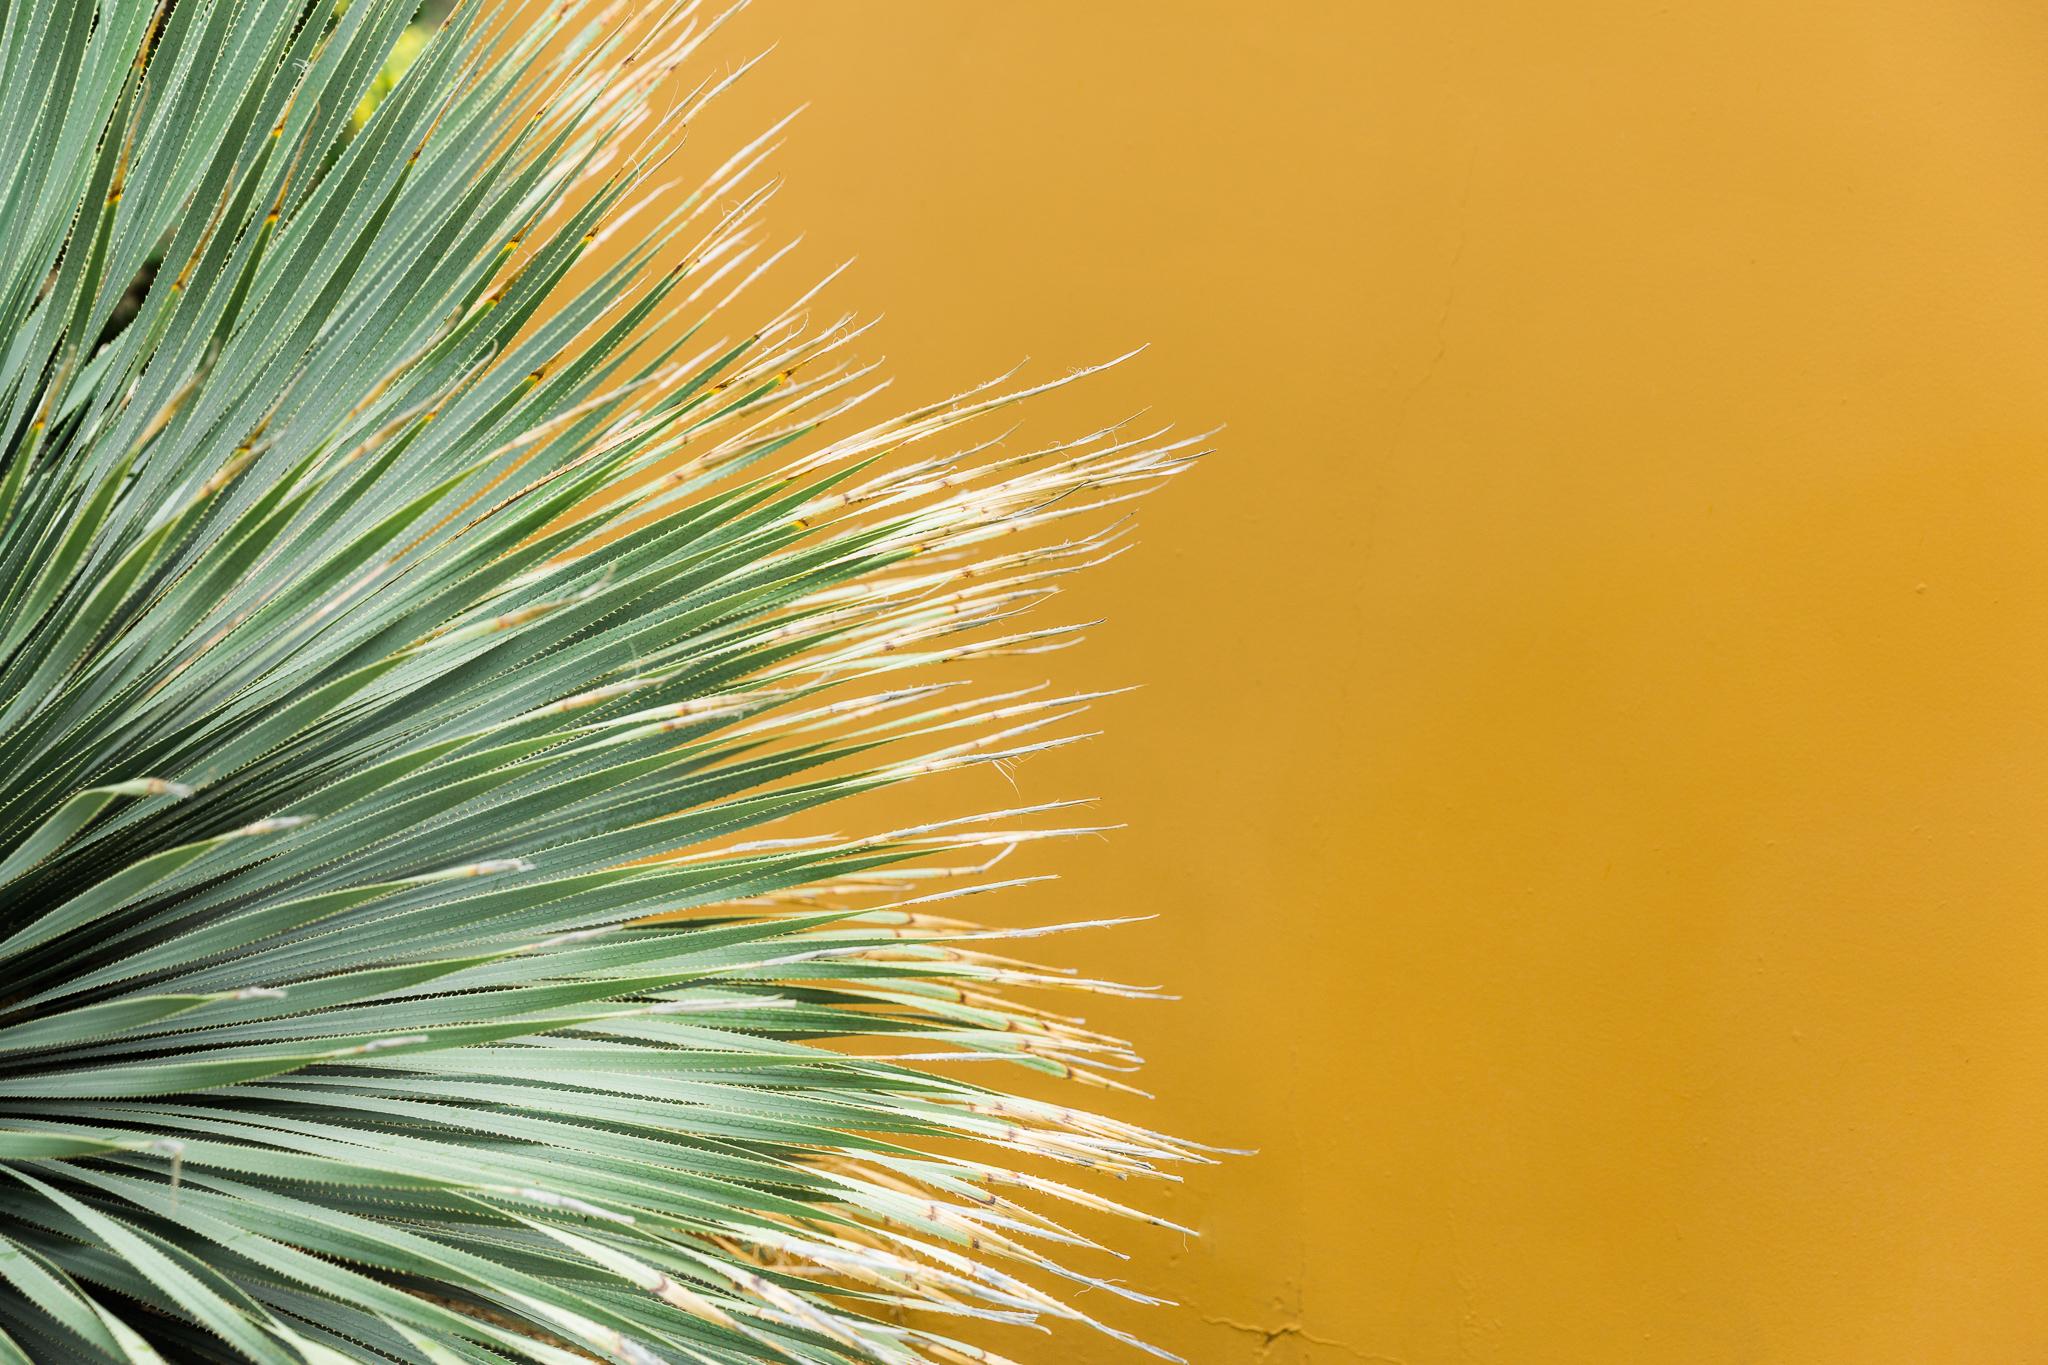 Arizona_yellow wall and plant.jpg